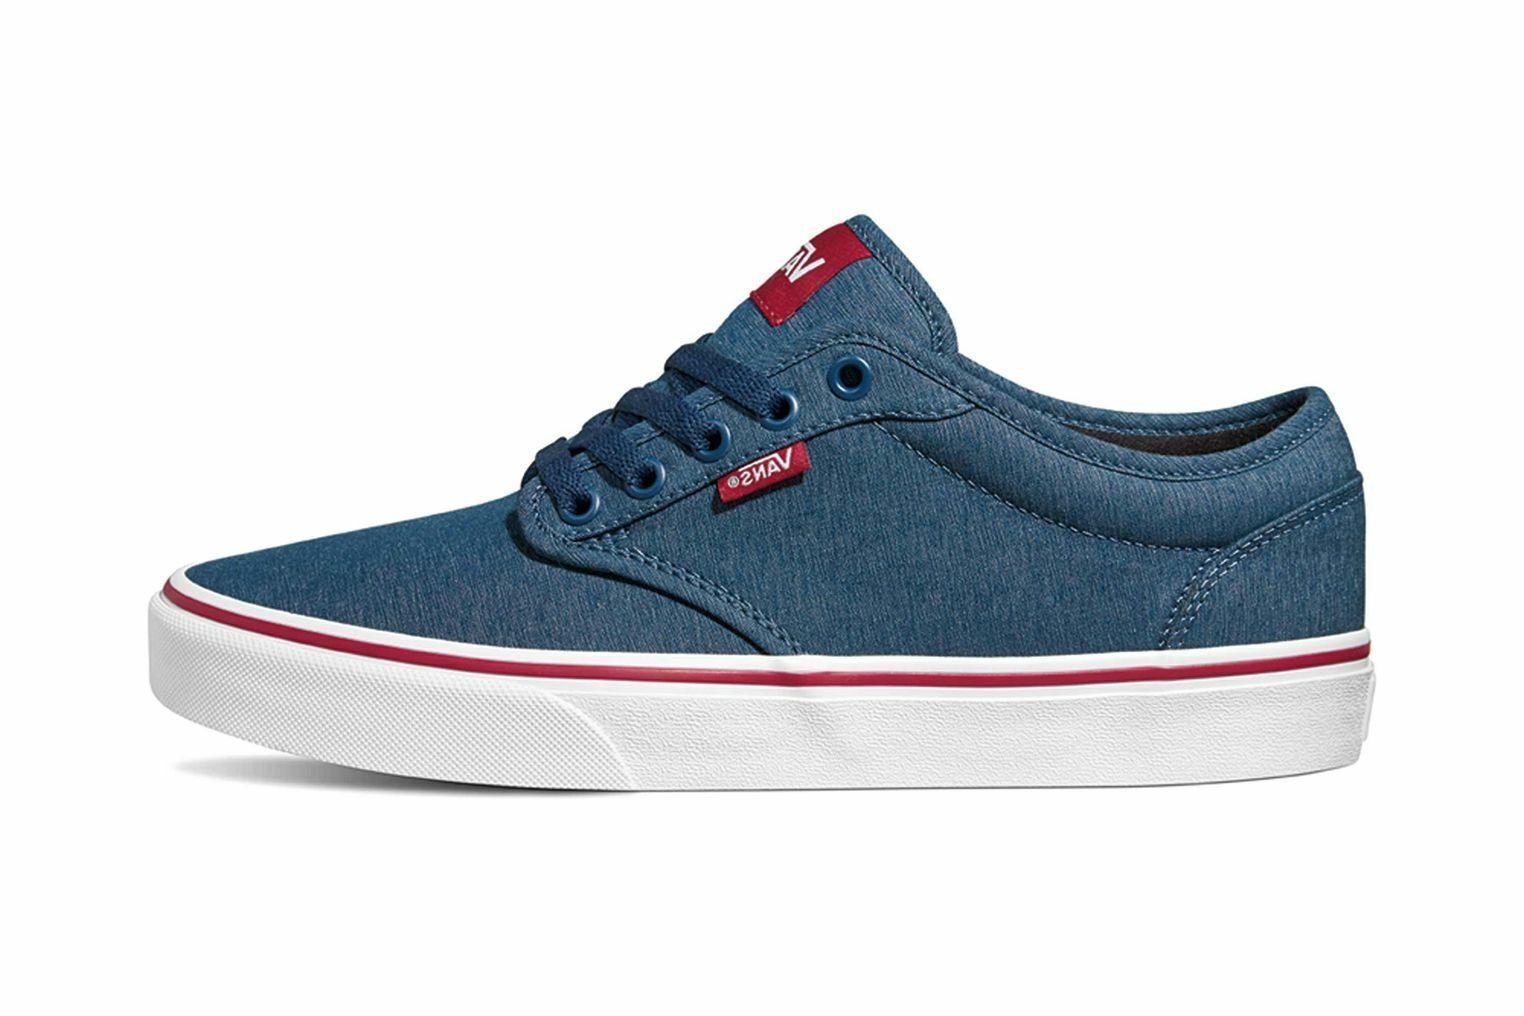 VANS MN Atwood (Varsity (Varsity (Varsity Textile) Sailor Sneaker in Übergrößen blue VN0A45J9VEL g d2cfaa